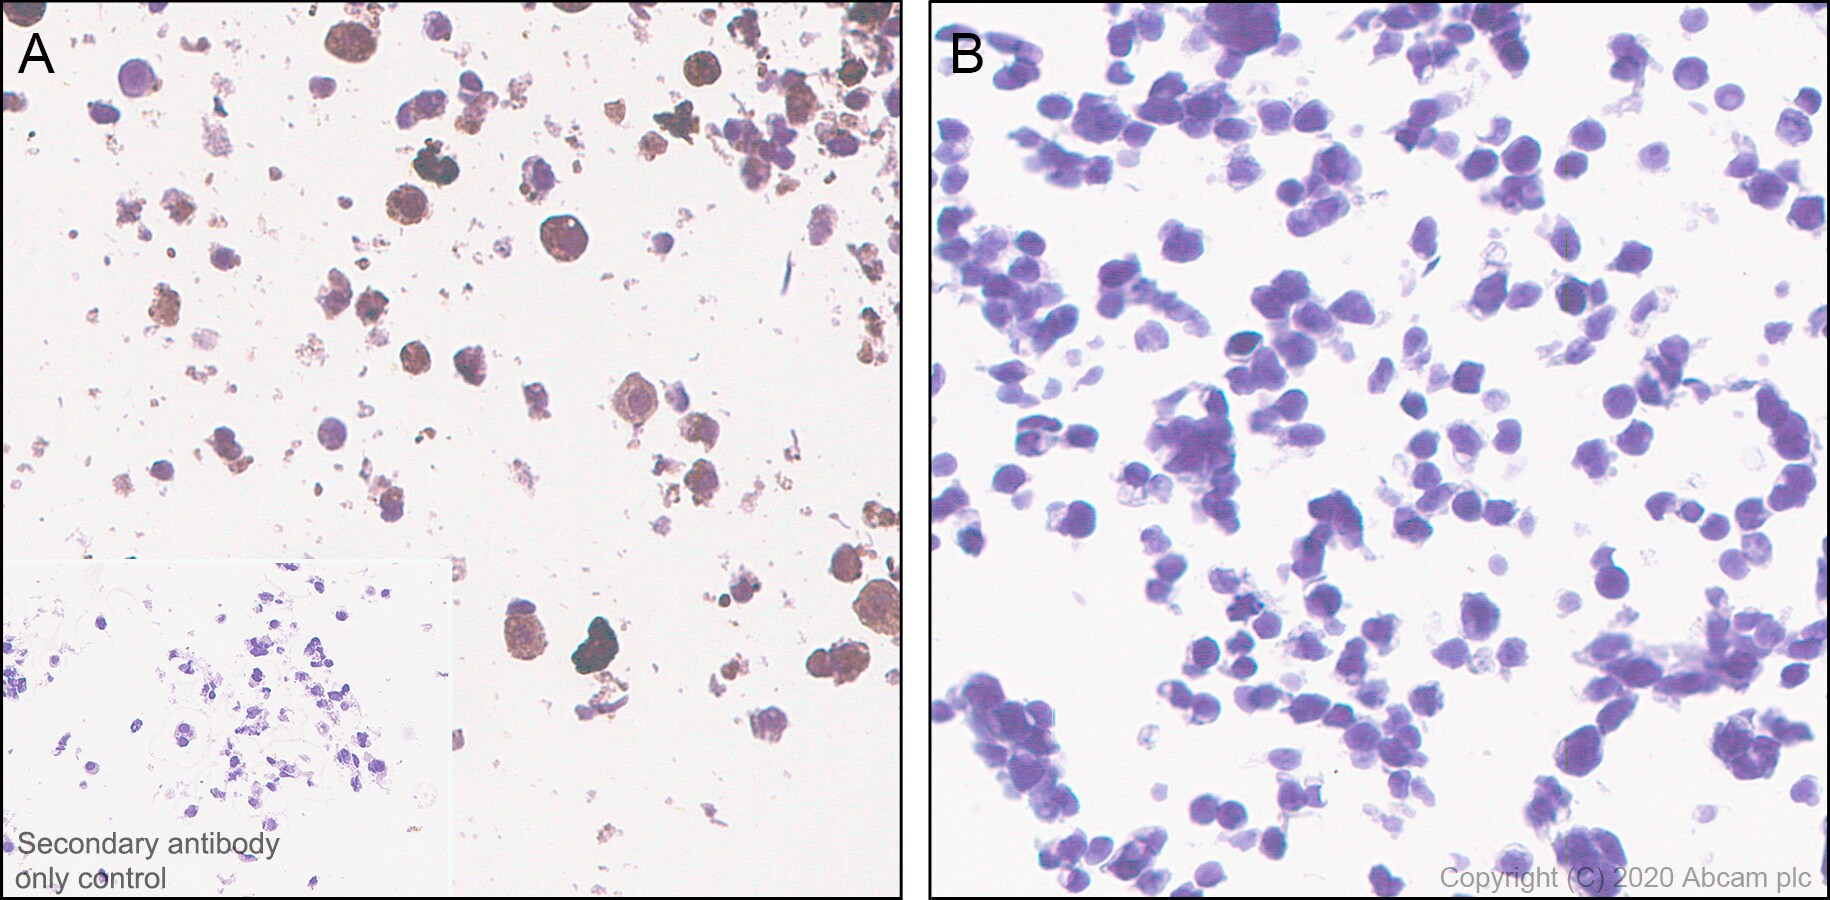 Immunohistochemistry (Formalin/PFA-fixed paraffin-embedded sections) - Anti-CRISPR-Cas9 antibody [KANI345B] (ab271293)